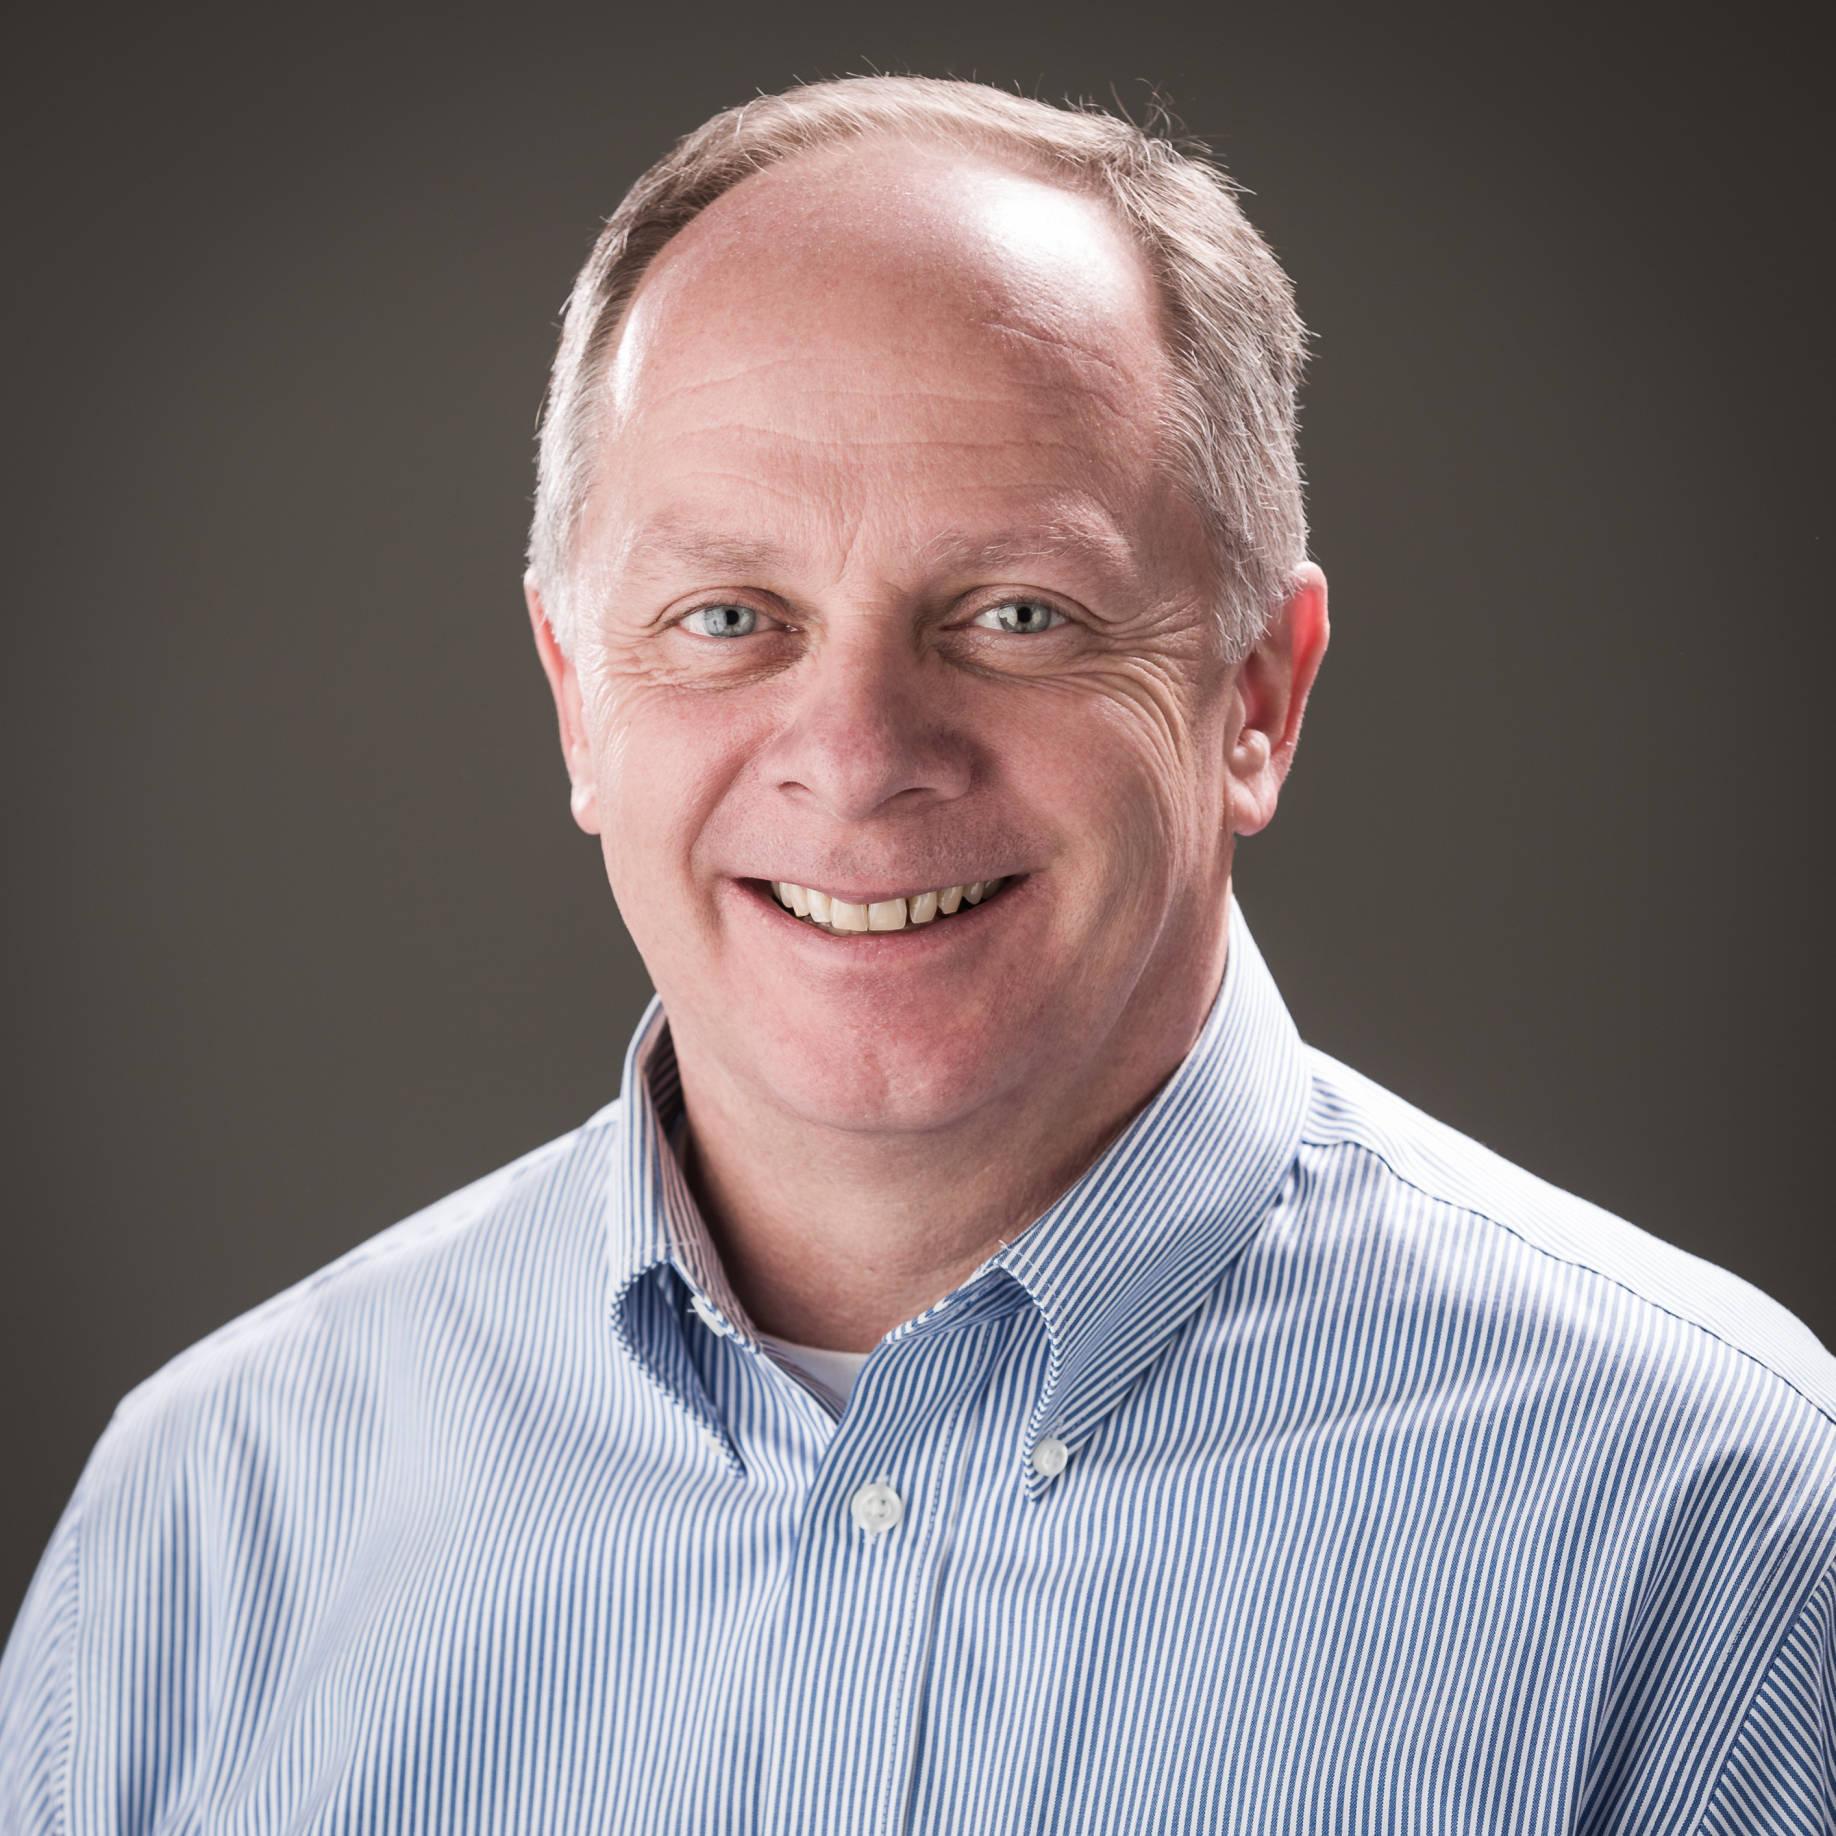 David Eddy, Director of Pre-Construction Planning, SSPX US District